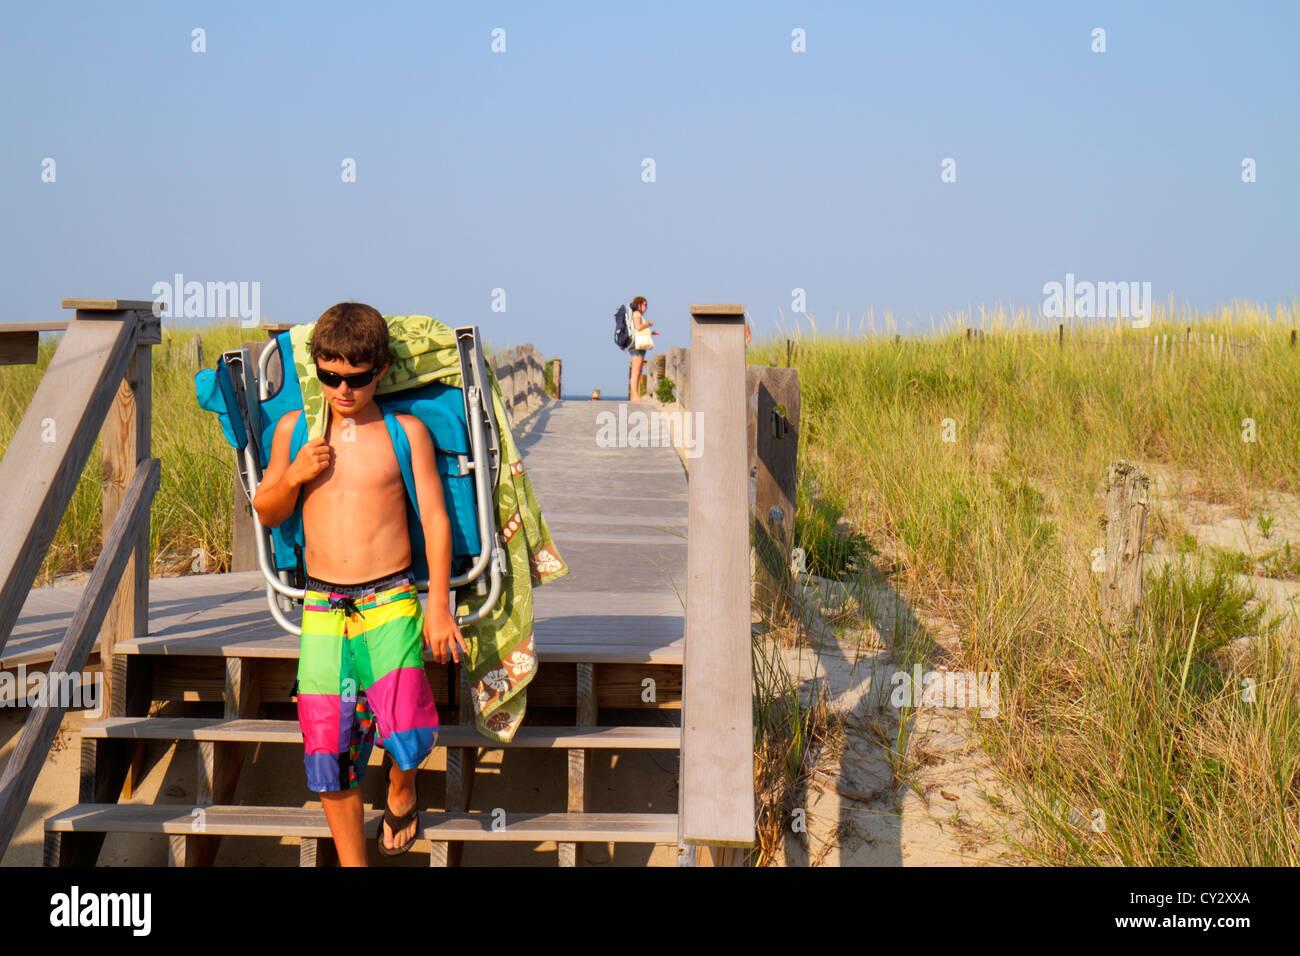 Massachusetts Cape Cod Nauset Beach Cape Cod National Seashore dune grass boardwalk sunbather boy sunglasses bathing - Stock Image